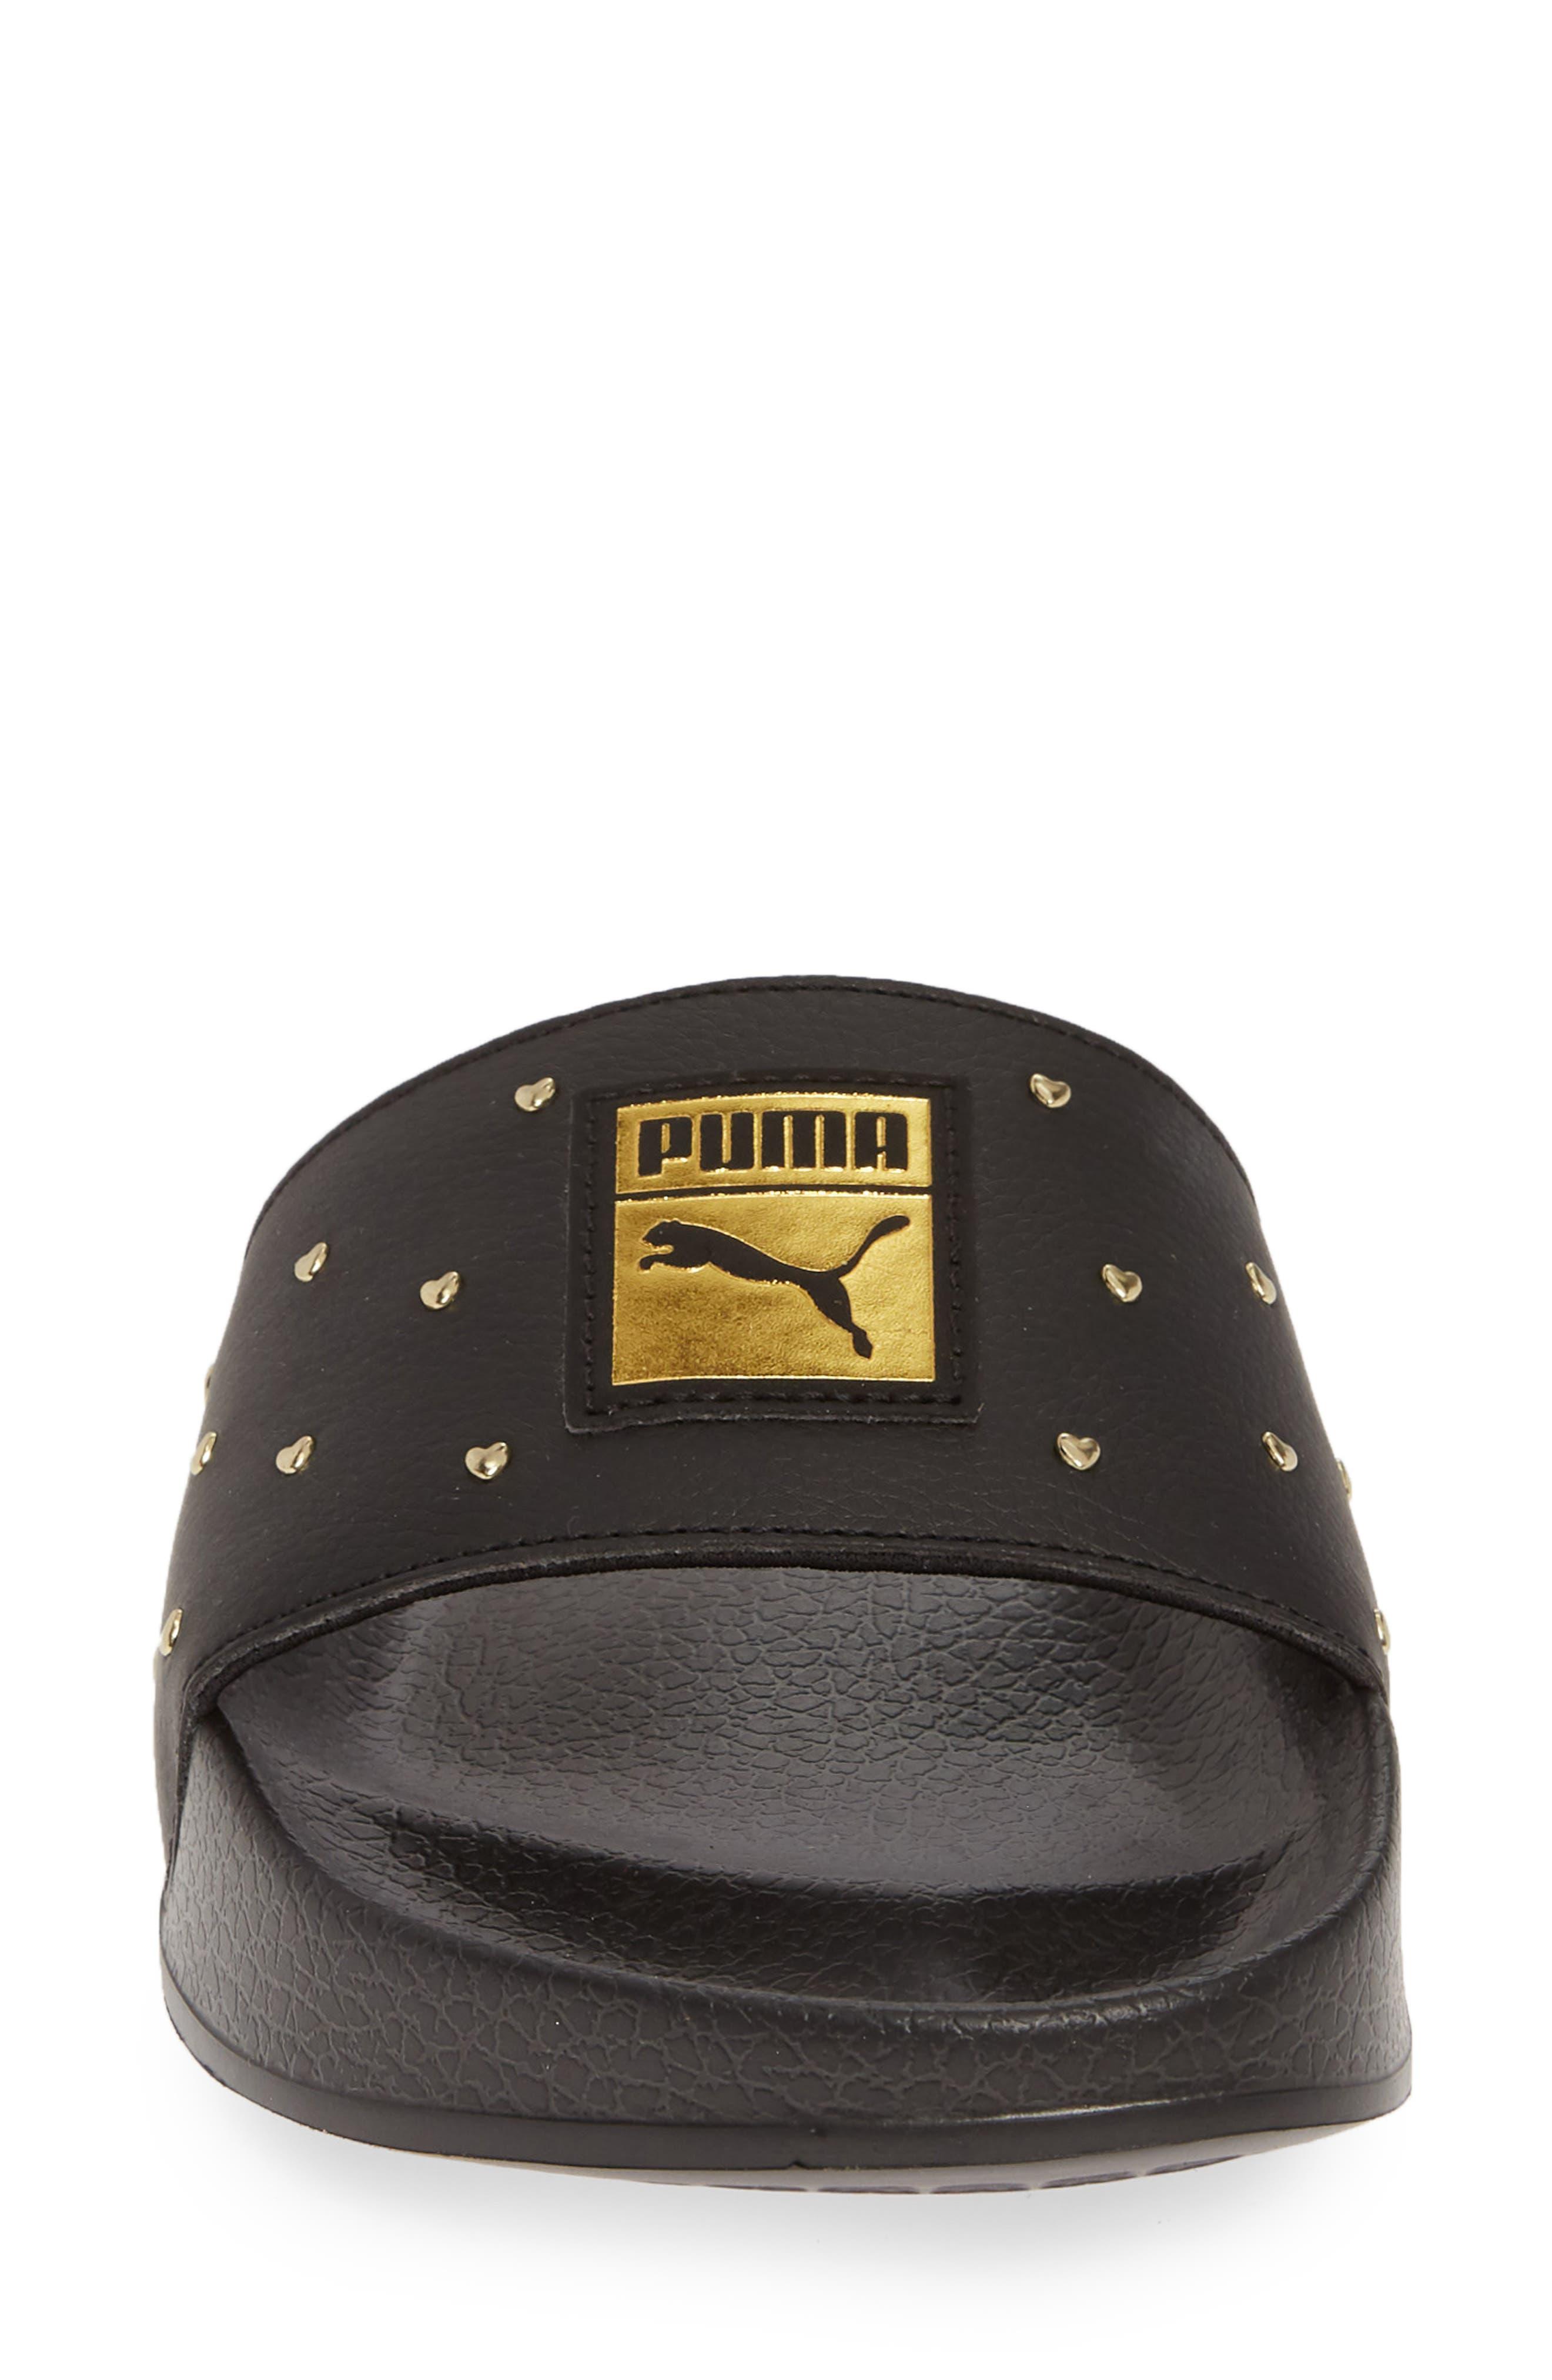 PUMA, Leadcat Studs Sport Slide, Alternate thumbnail 4, color, BLACK/ TEAM GOLD